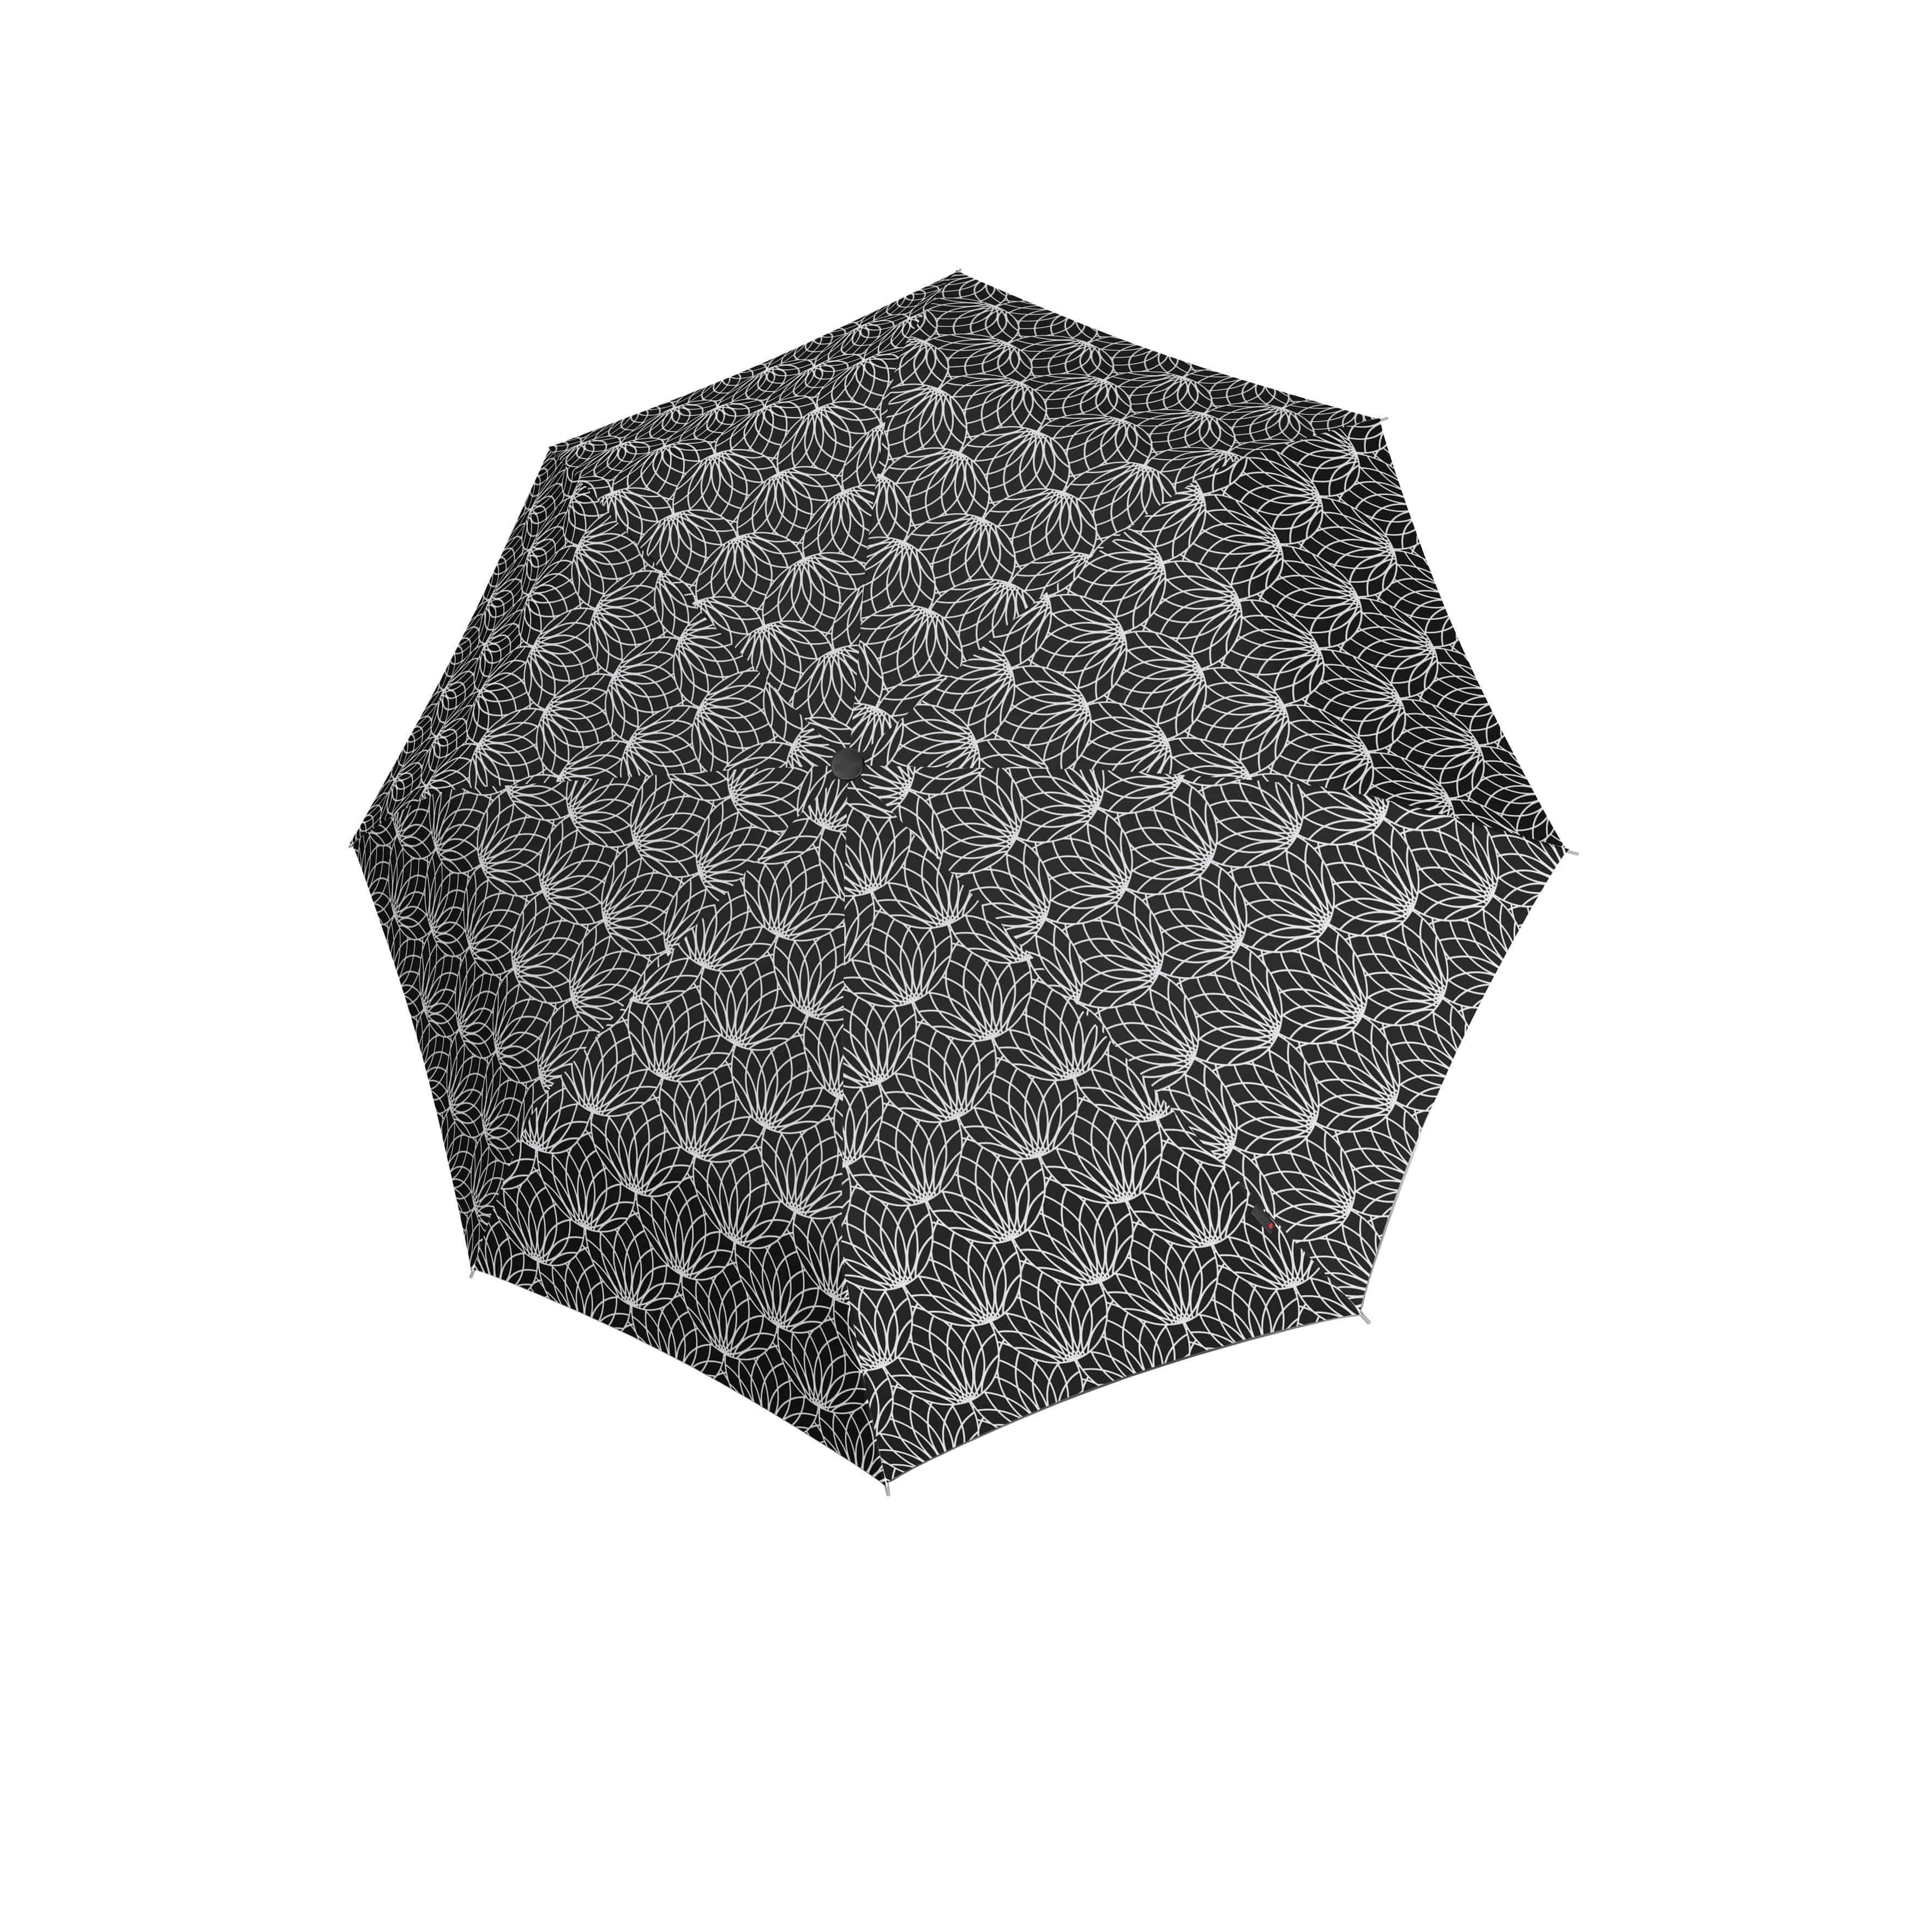 Knirps Umbrella Knirps T.200 medium duomatic renature black ecorepel with UV Protection